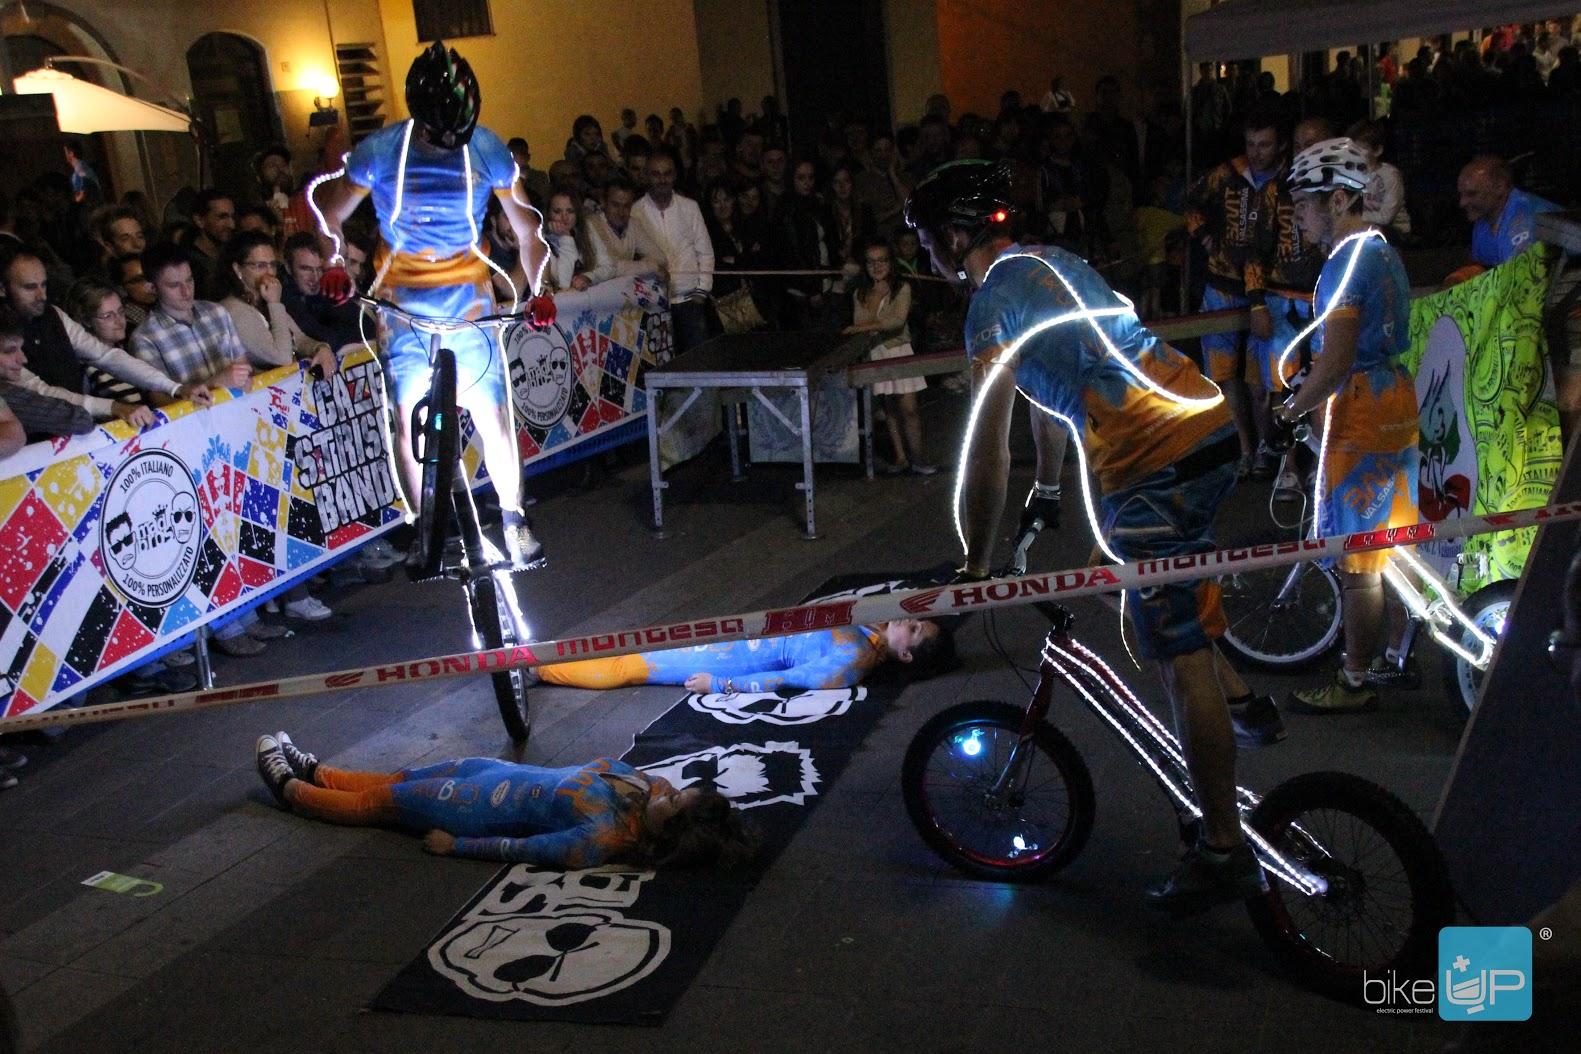 BikeUP_BMT-show-night-L.jpg